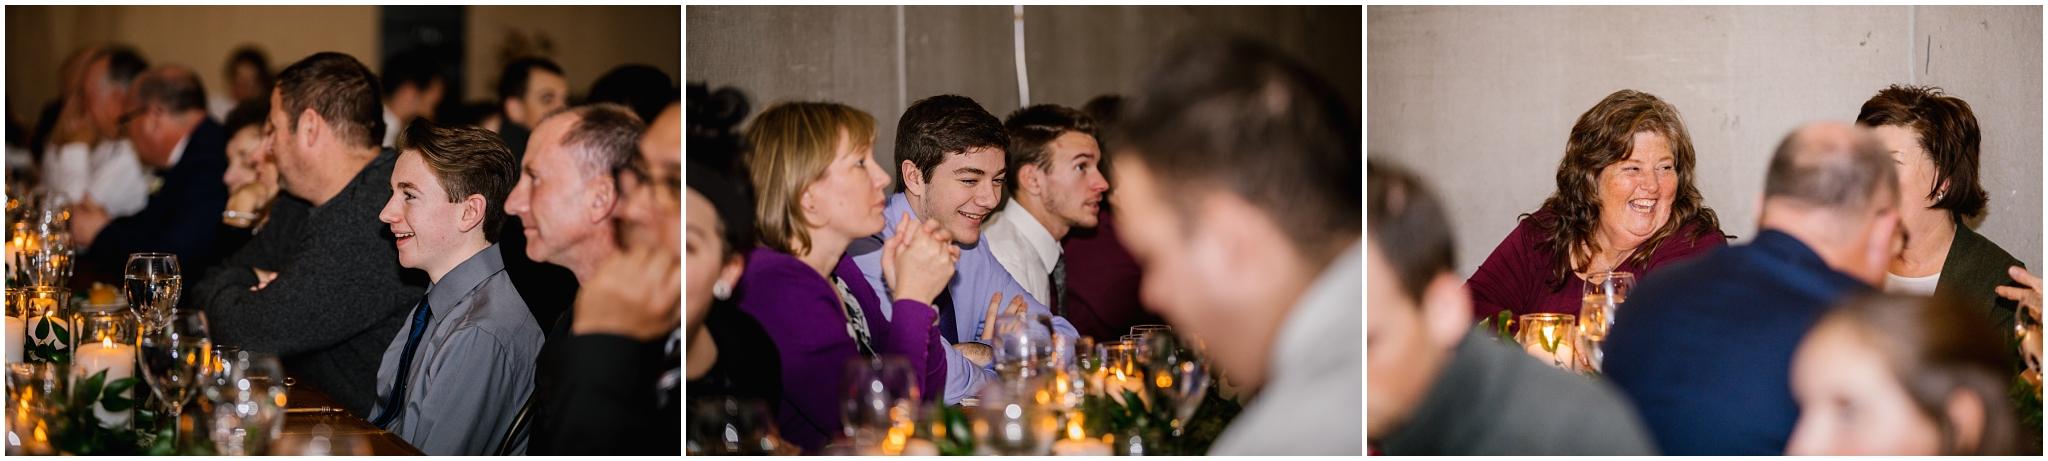 CN-Wedding-380_Lizzie-B-Imagery-Utah-Wedding-Photographer-Blessed-Sacrament-Catholic-Church-Sandy-Utah-The-Blended-Table-Salt-Lake-City.jpg